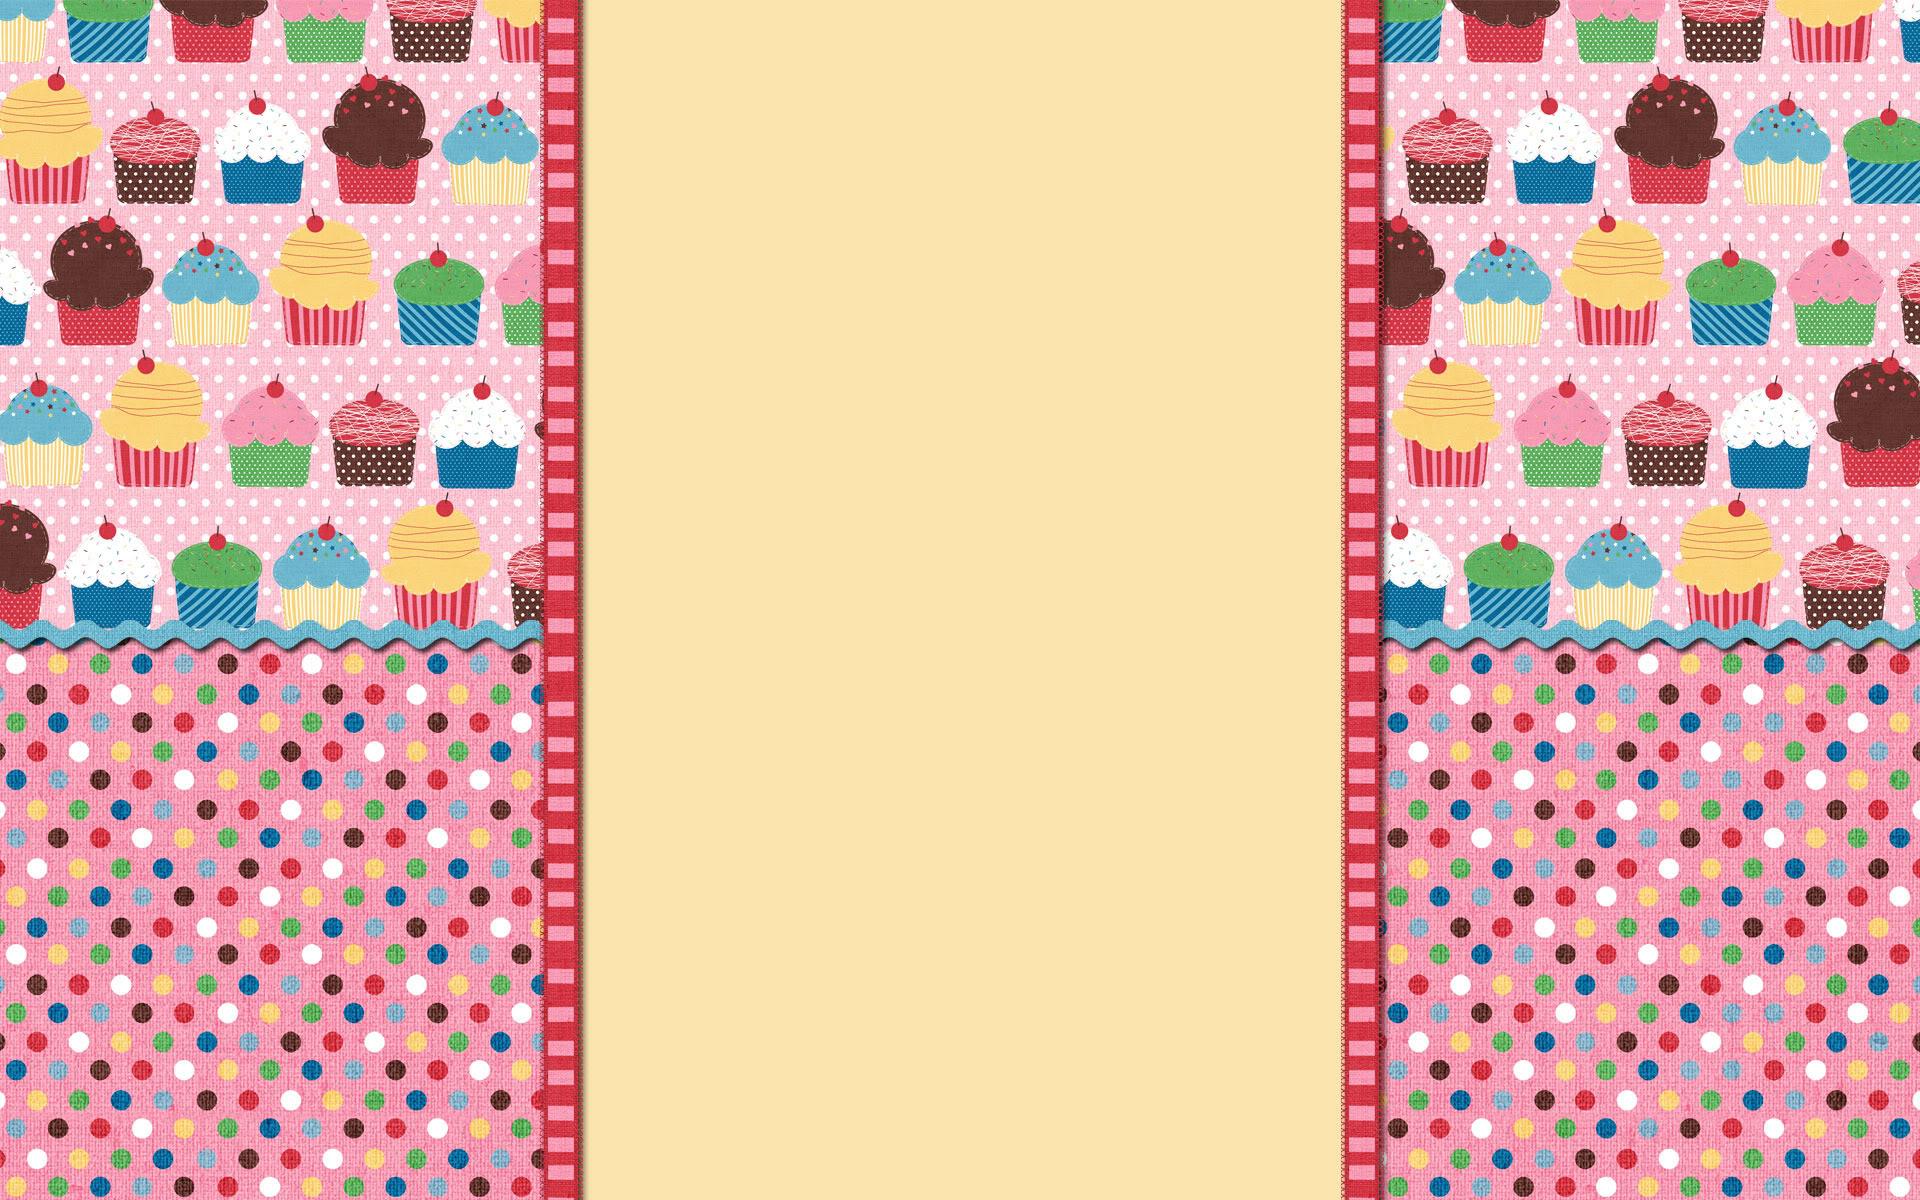 february cupcakes wallpaper - photo #38